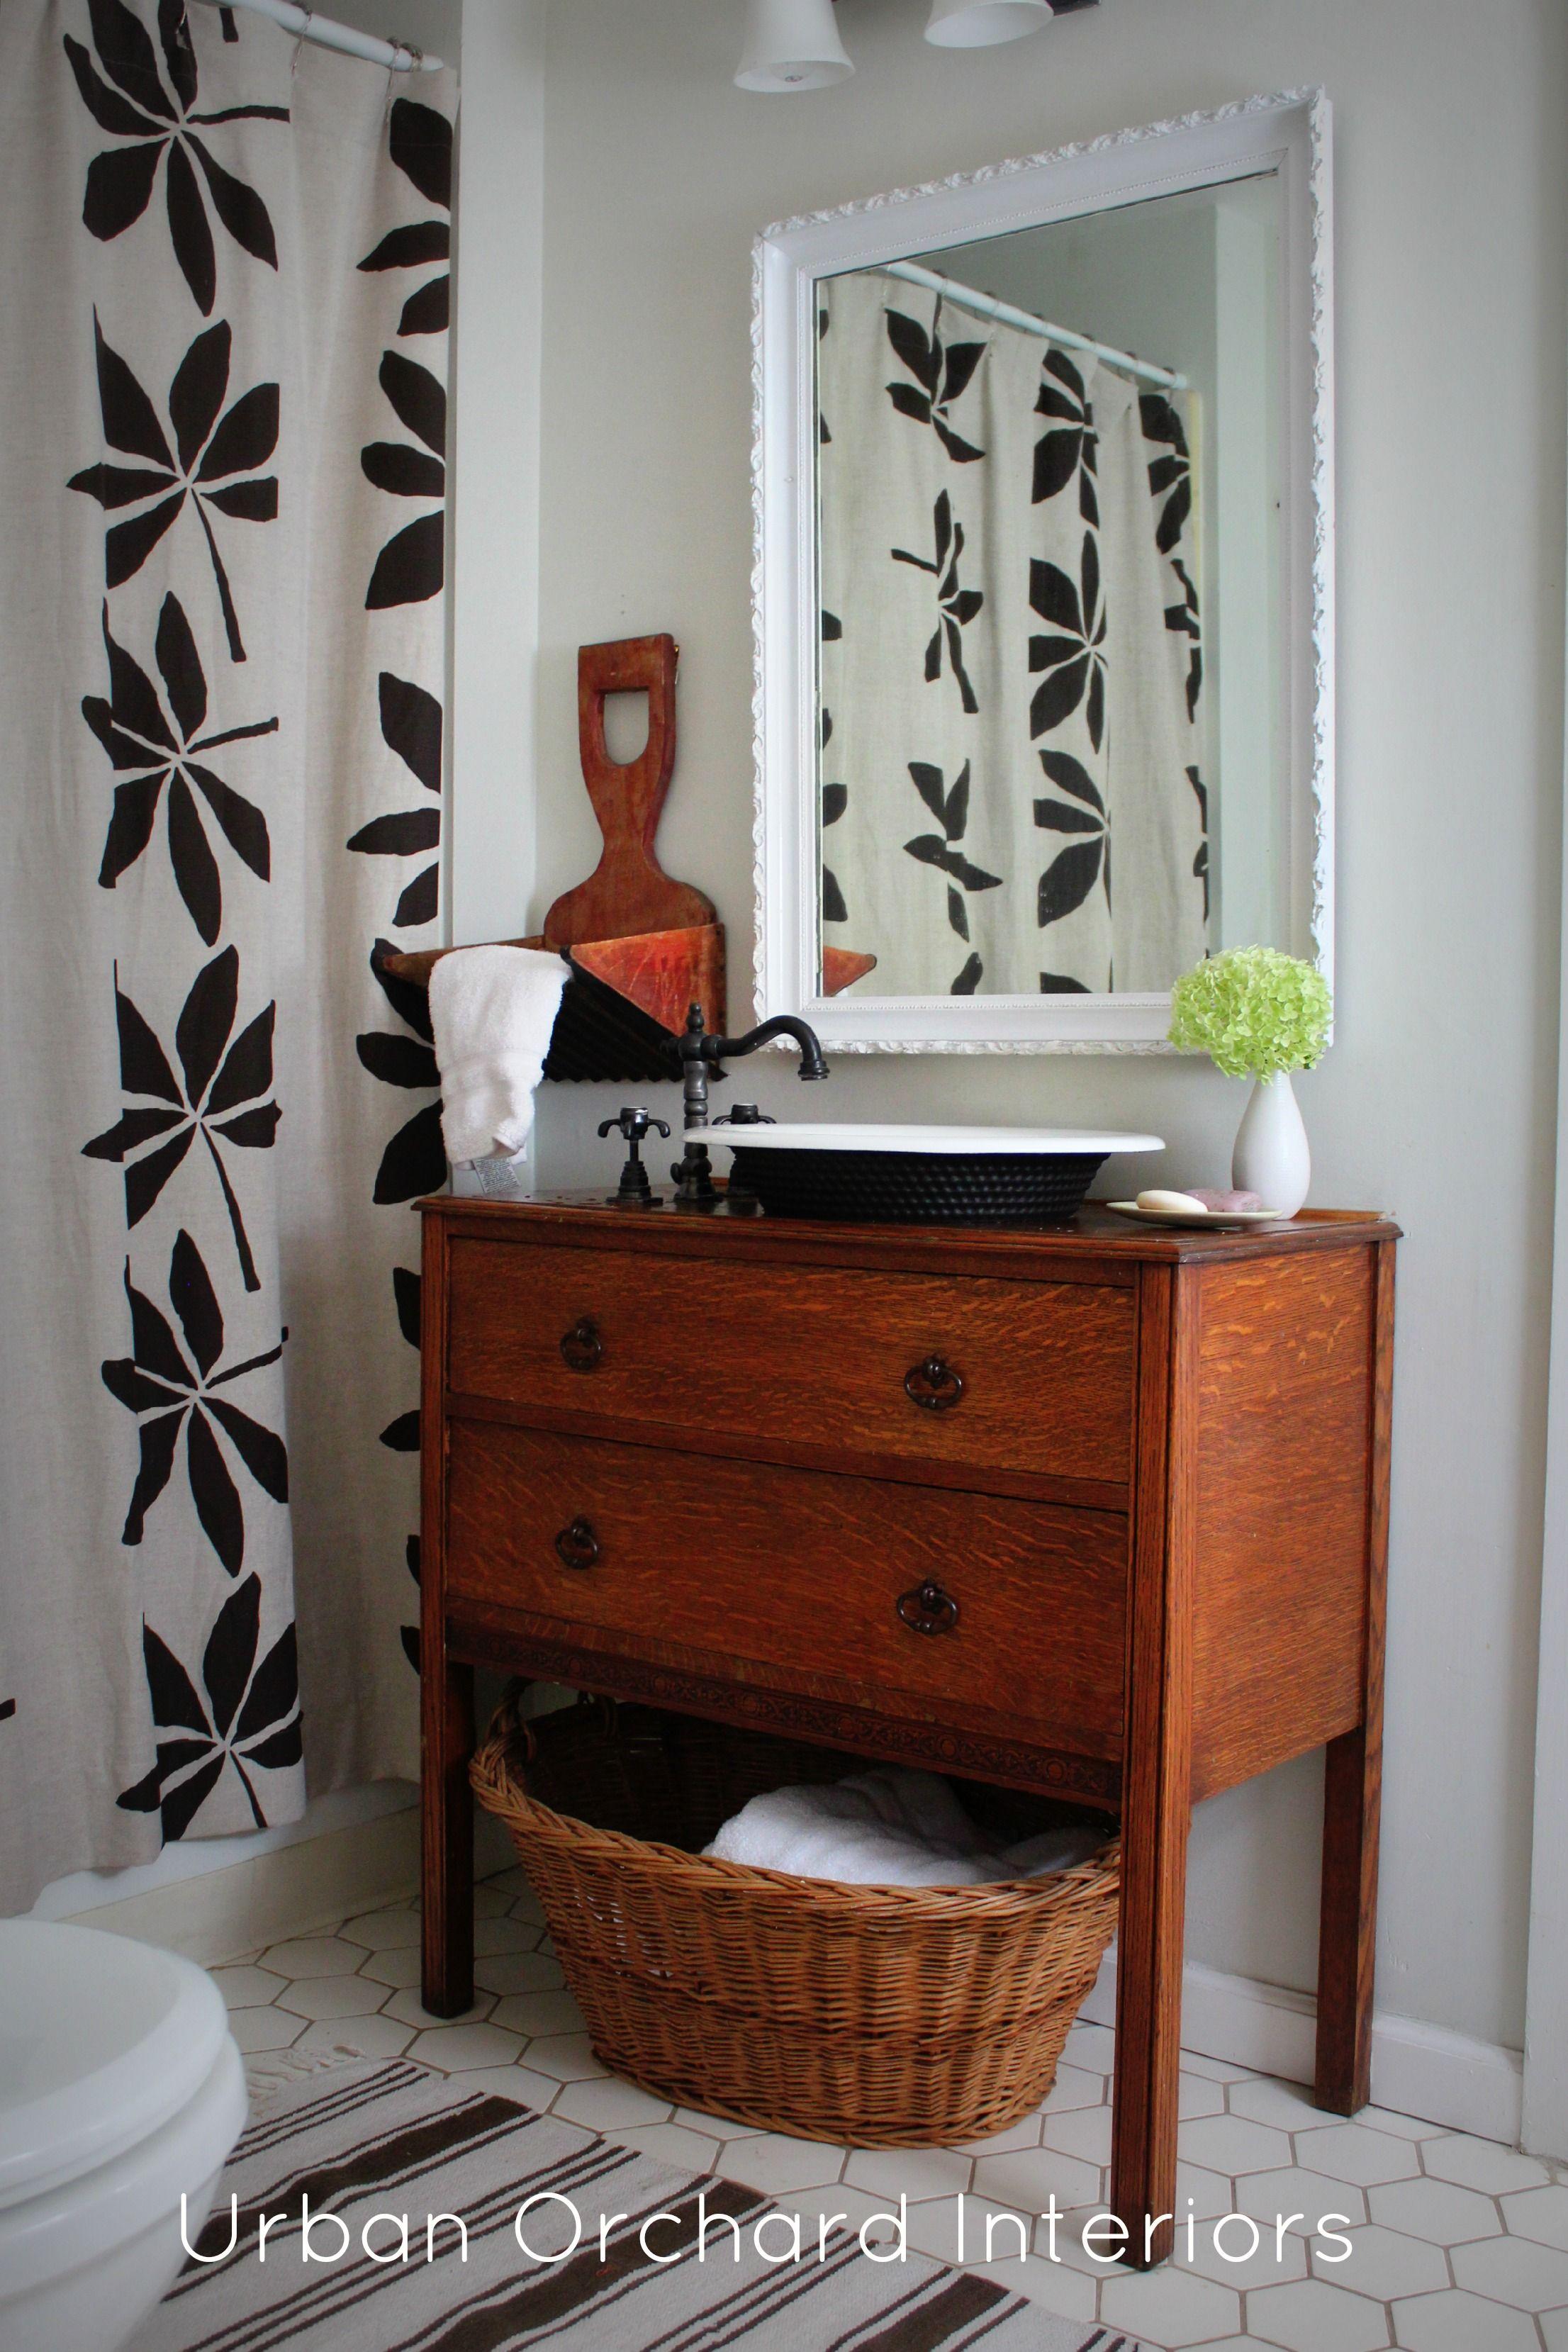 Like Old Dresser Converted Into Bath Vanity For The Home Pinterest Bath Vanities Dresser